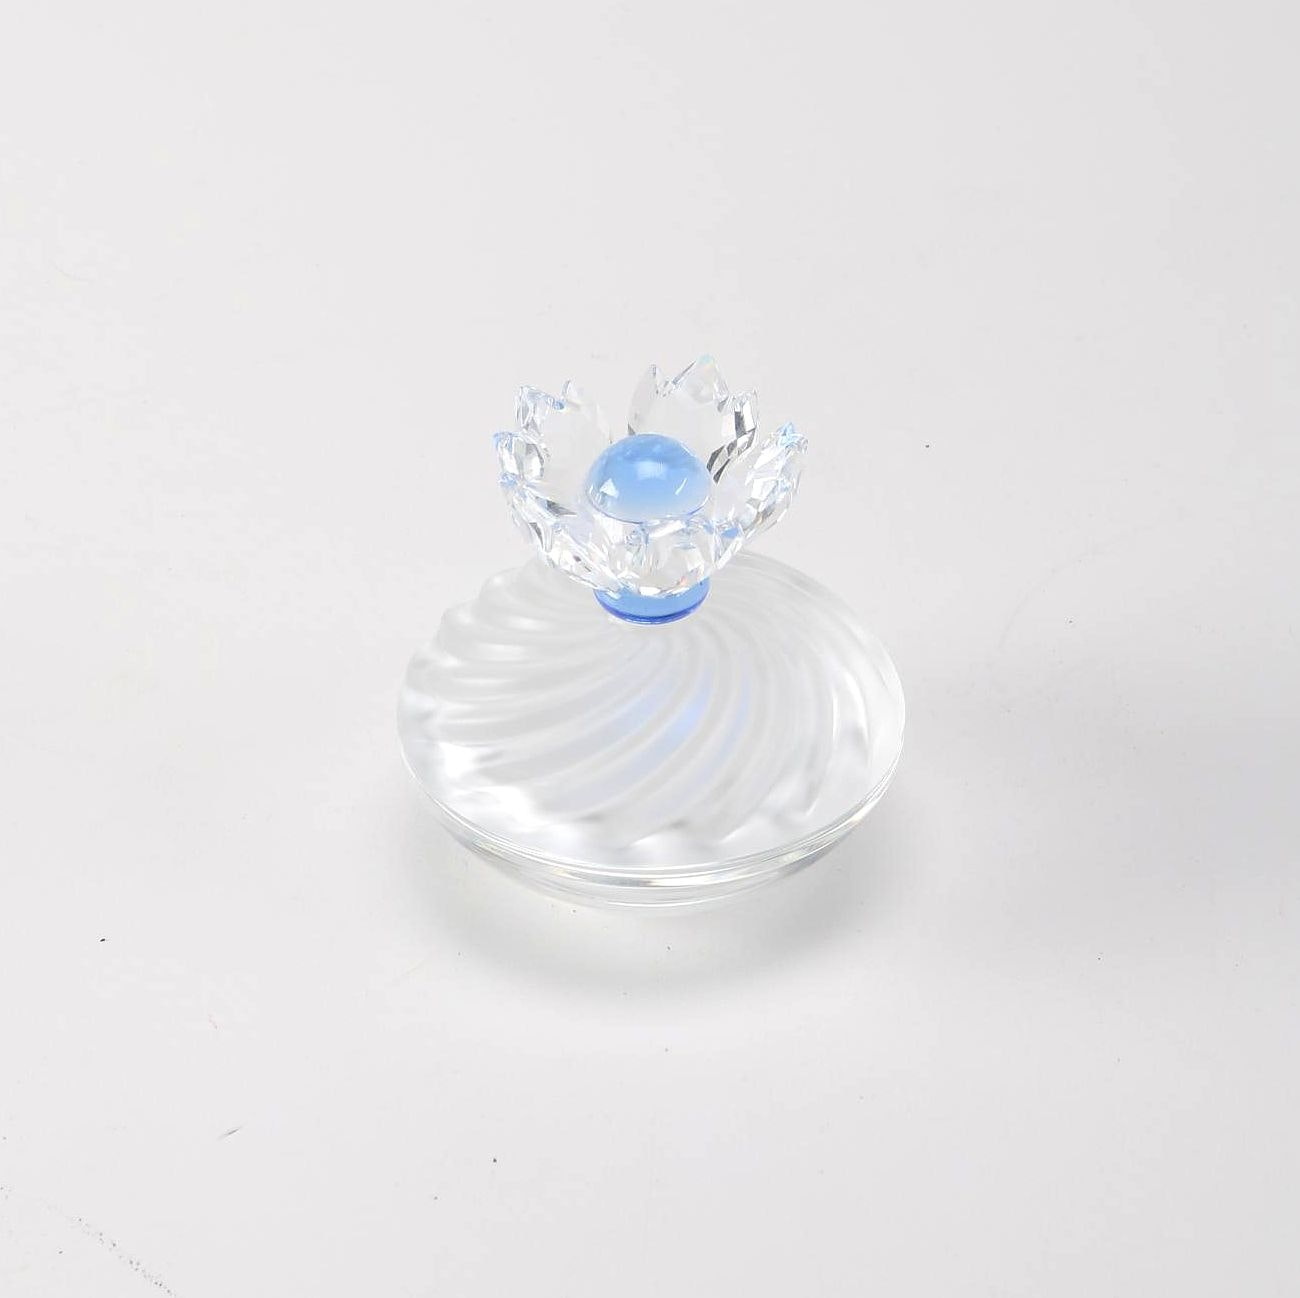 Swarovski Crystal Dish